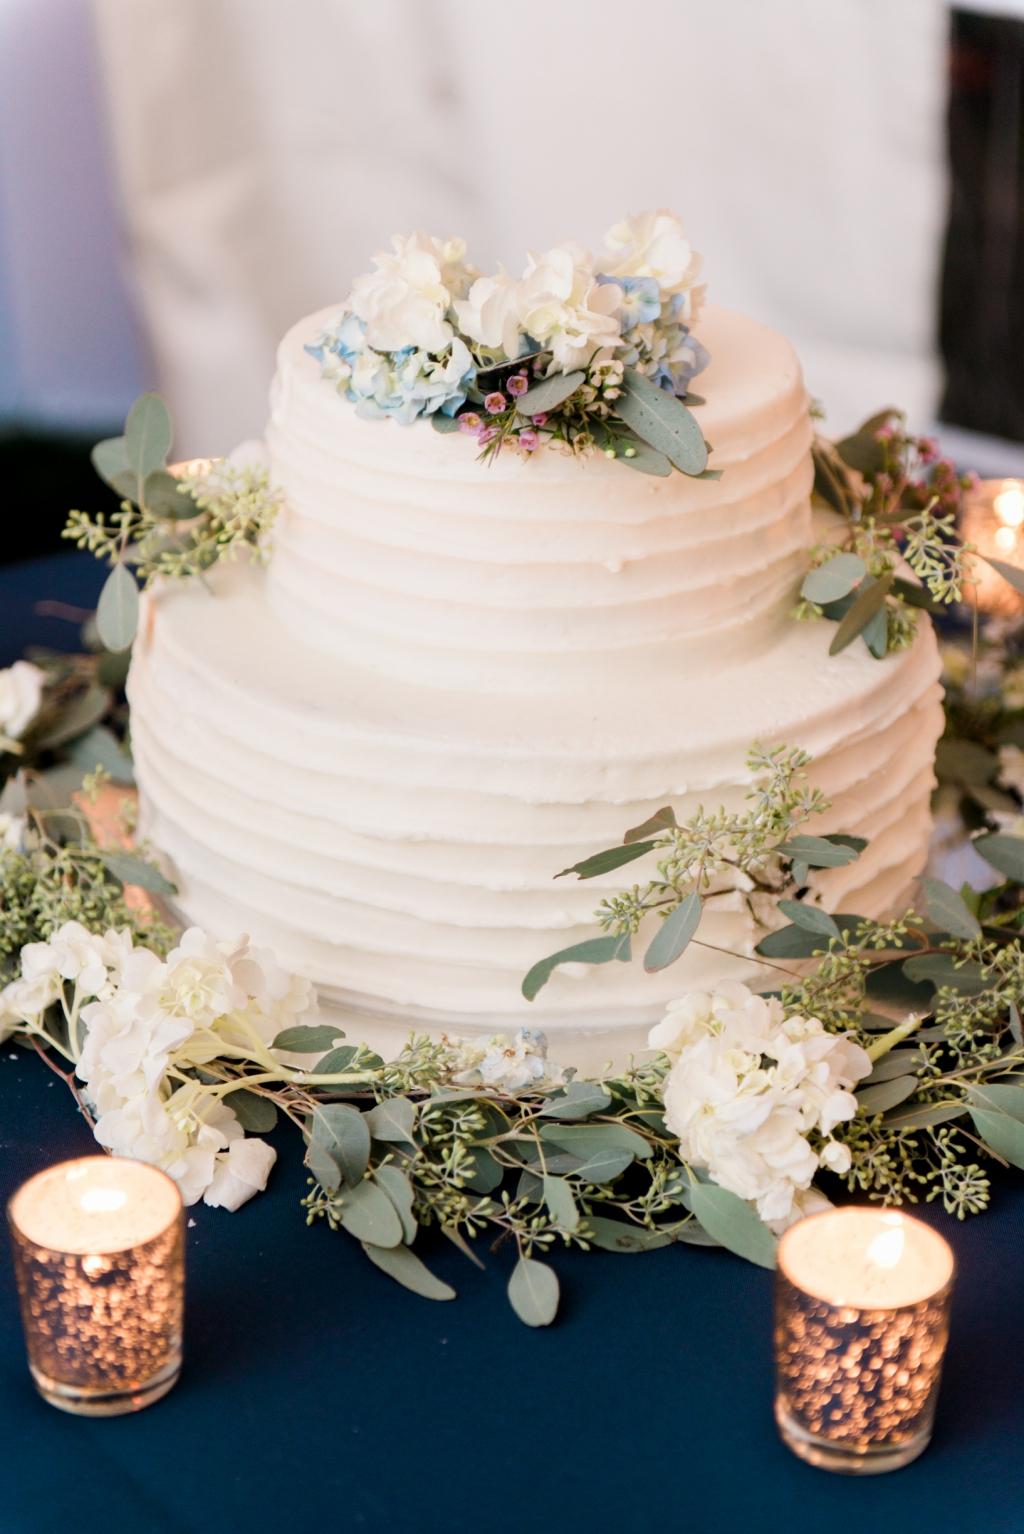 haley-richter-photography-buena-vista-confrence-center-wedding-summer-168